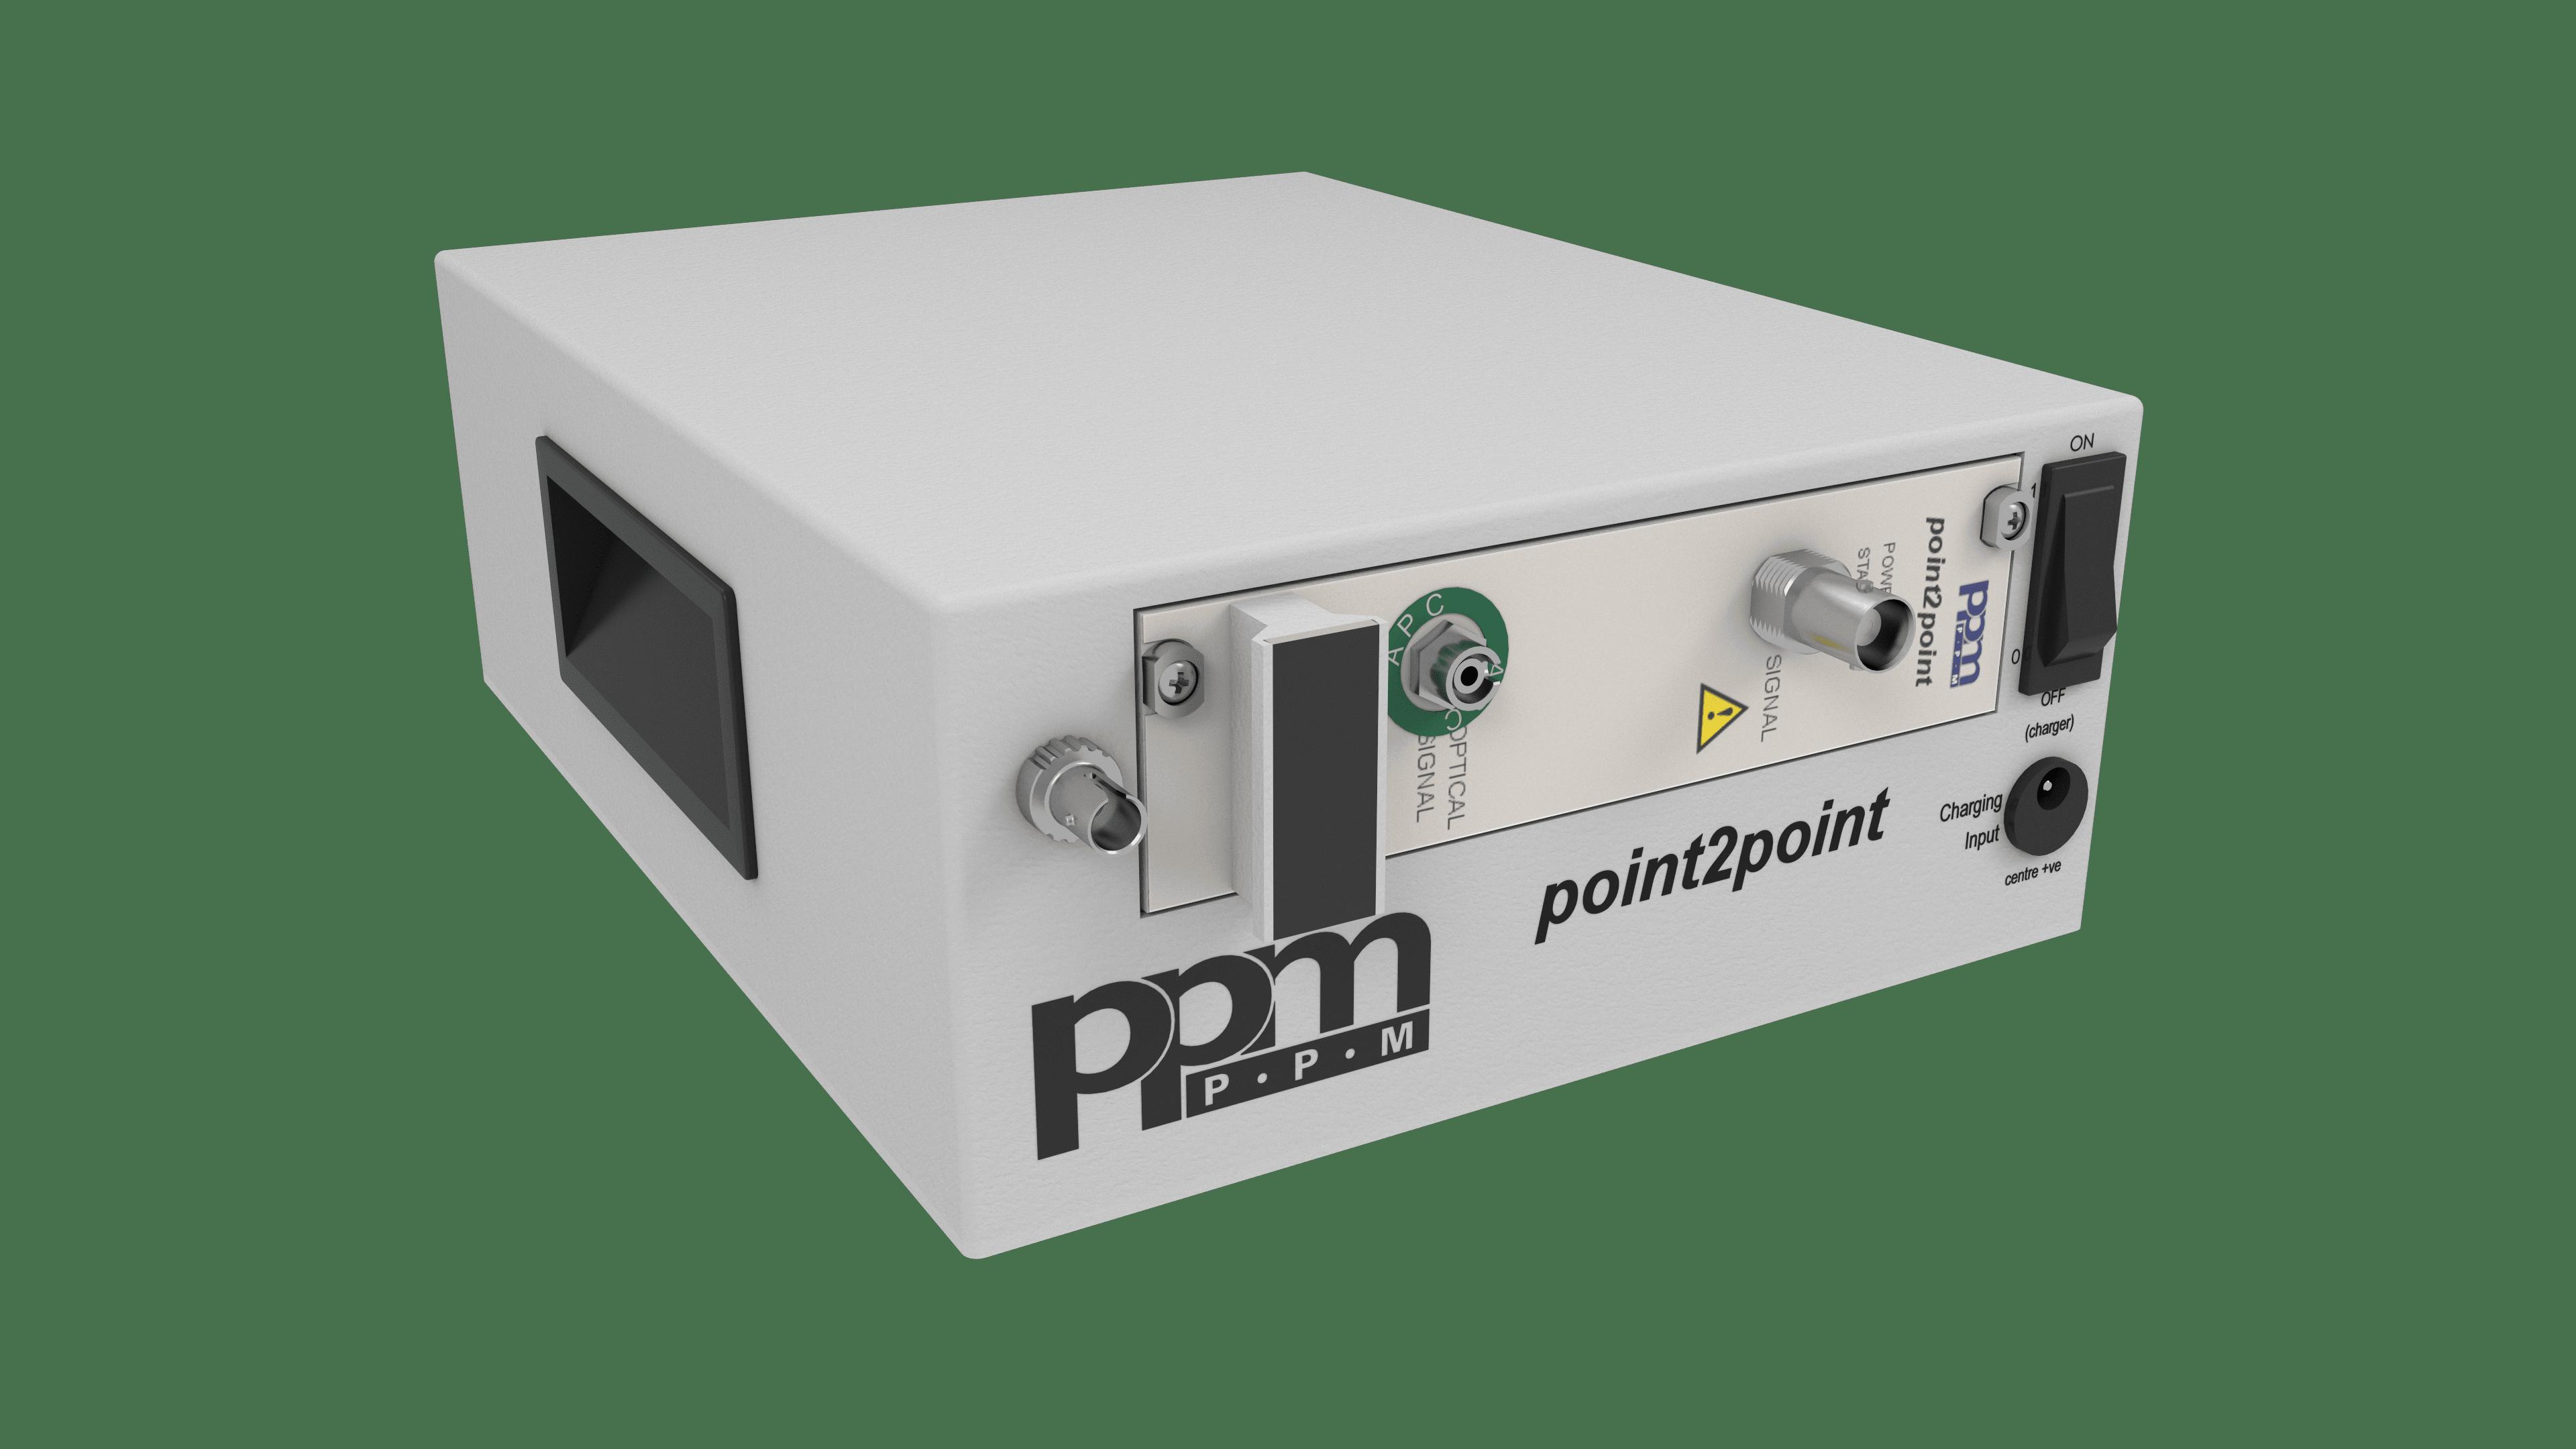 point2point fibre optic link